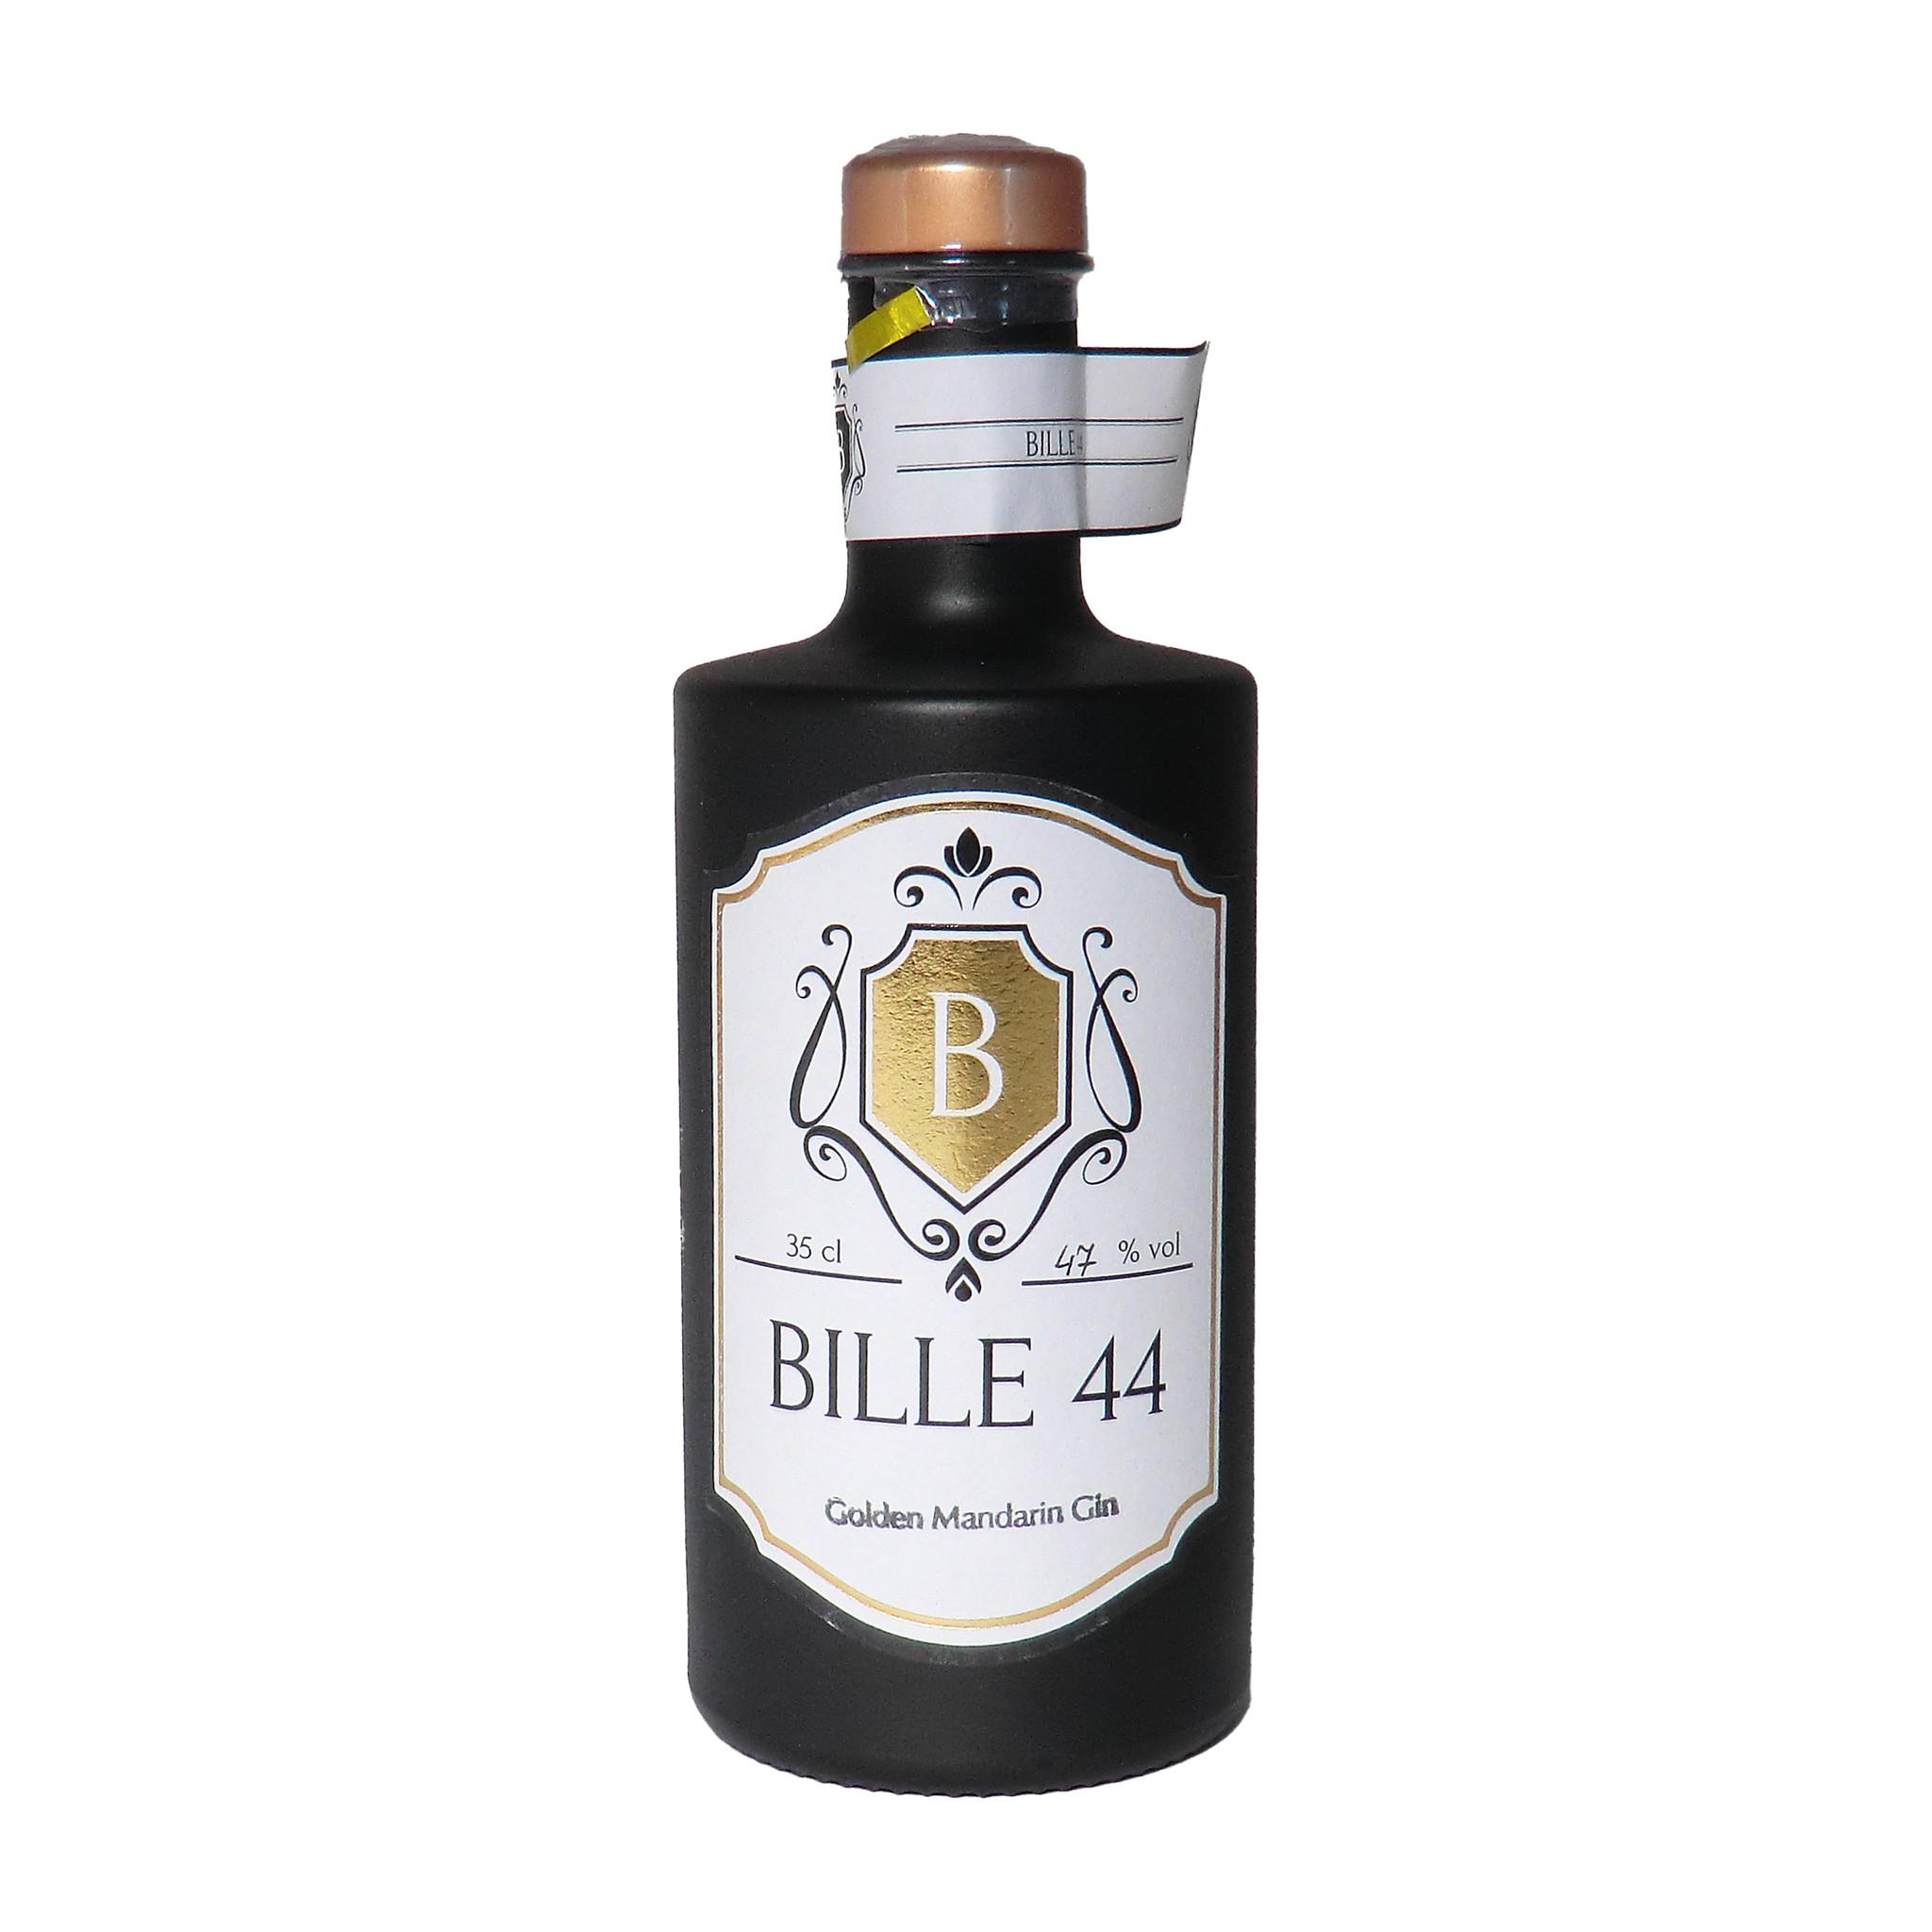 Bille44 - Premium Edelbrand  Golden Mandarin Gin 350ml